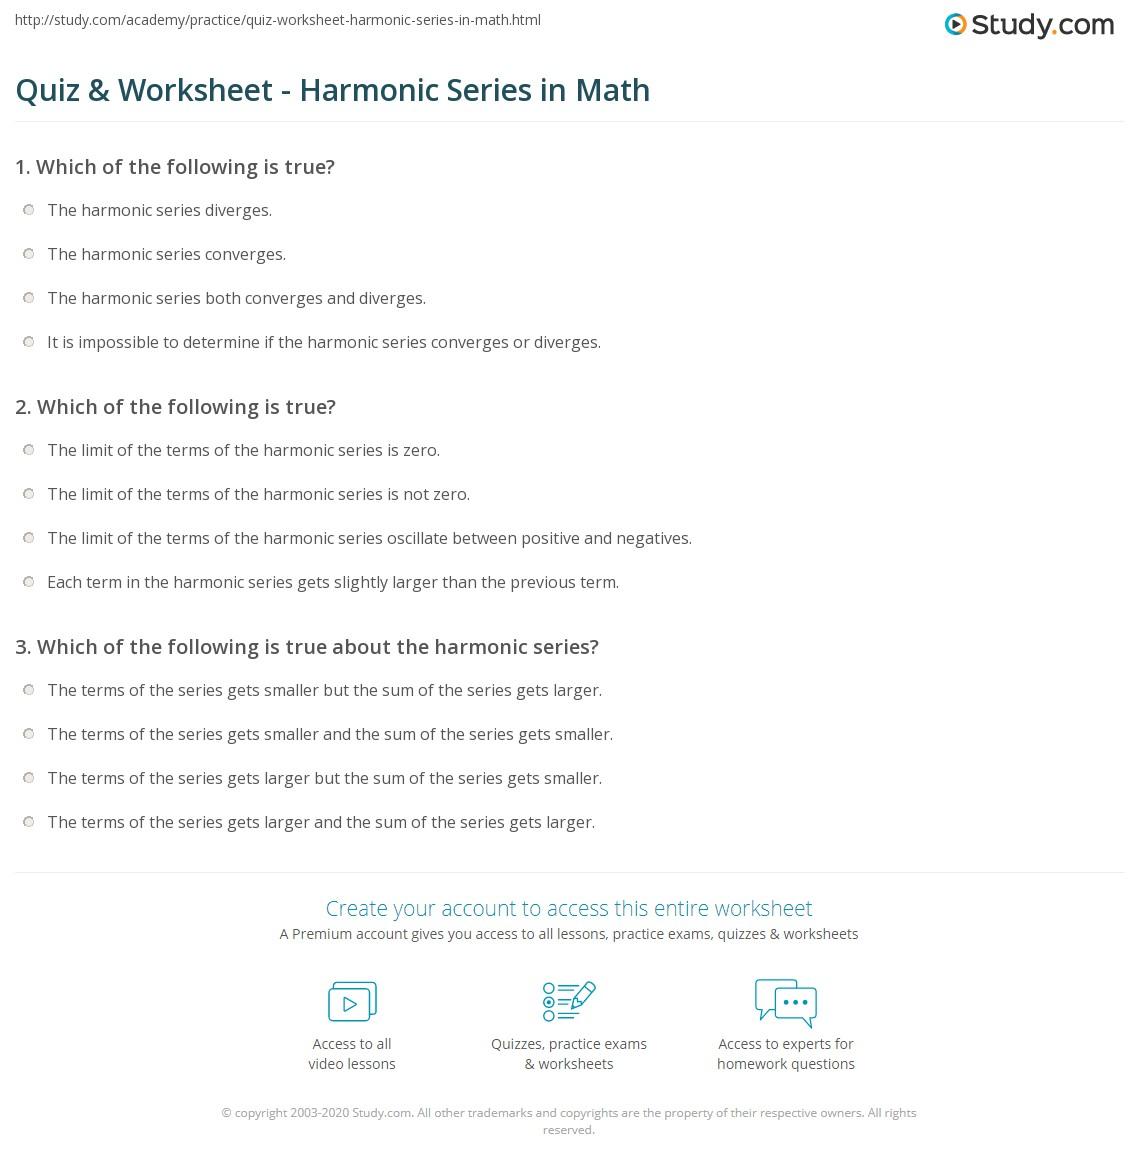 Quiz Worksheet Harmonic Series In Math Study